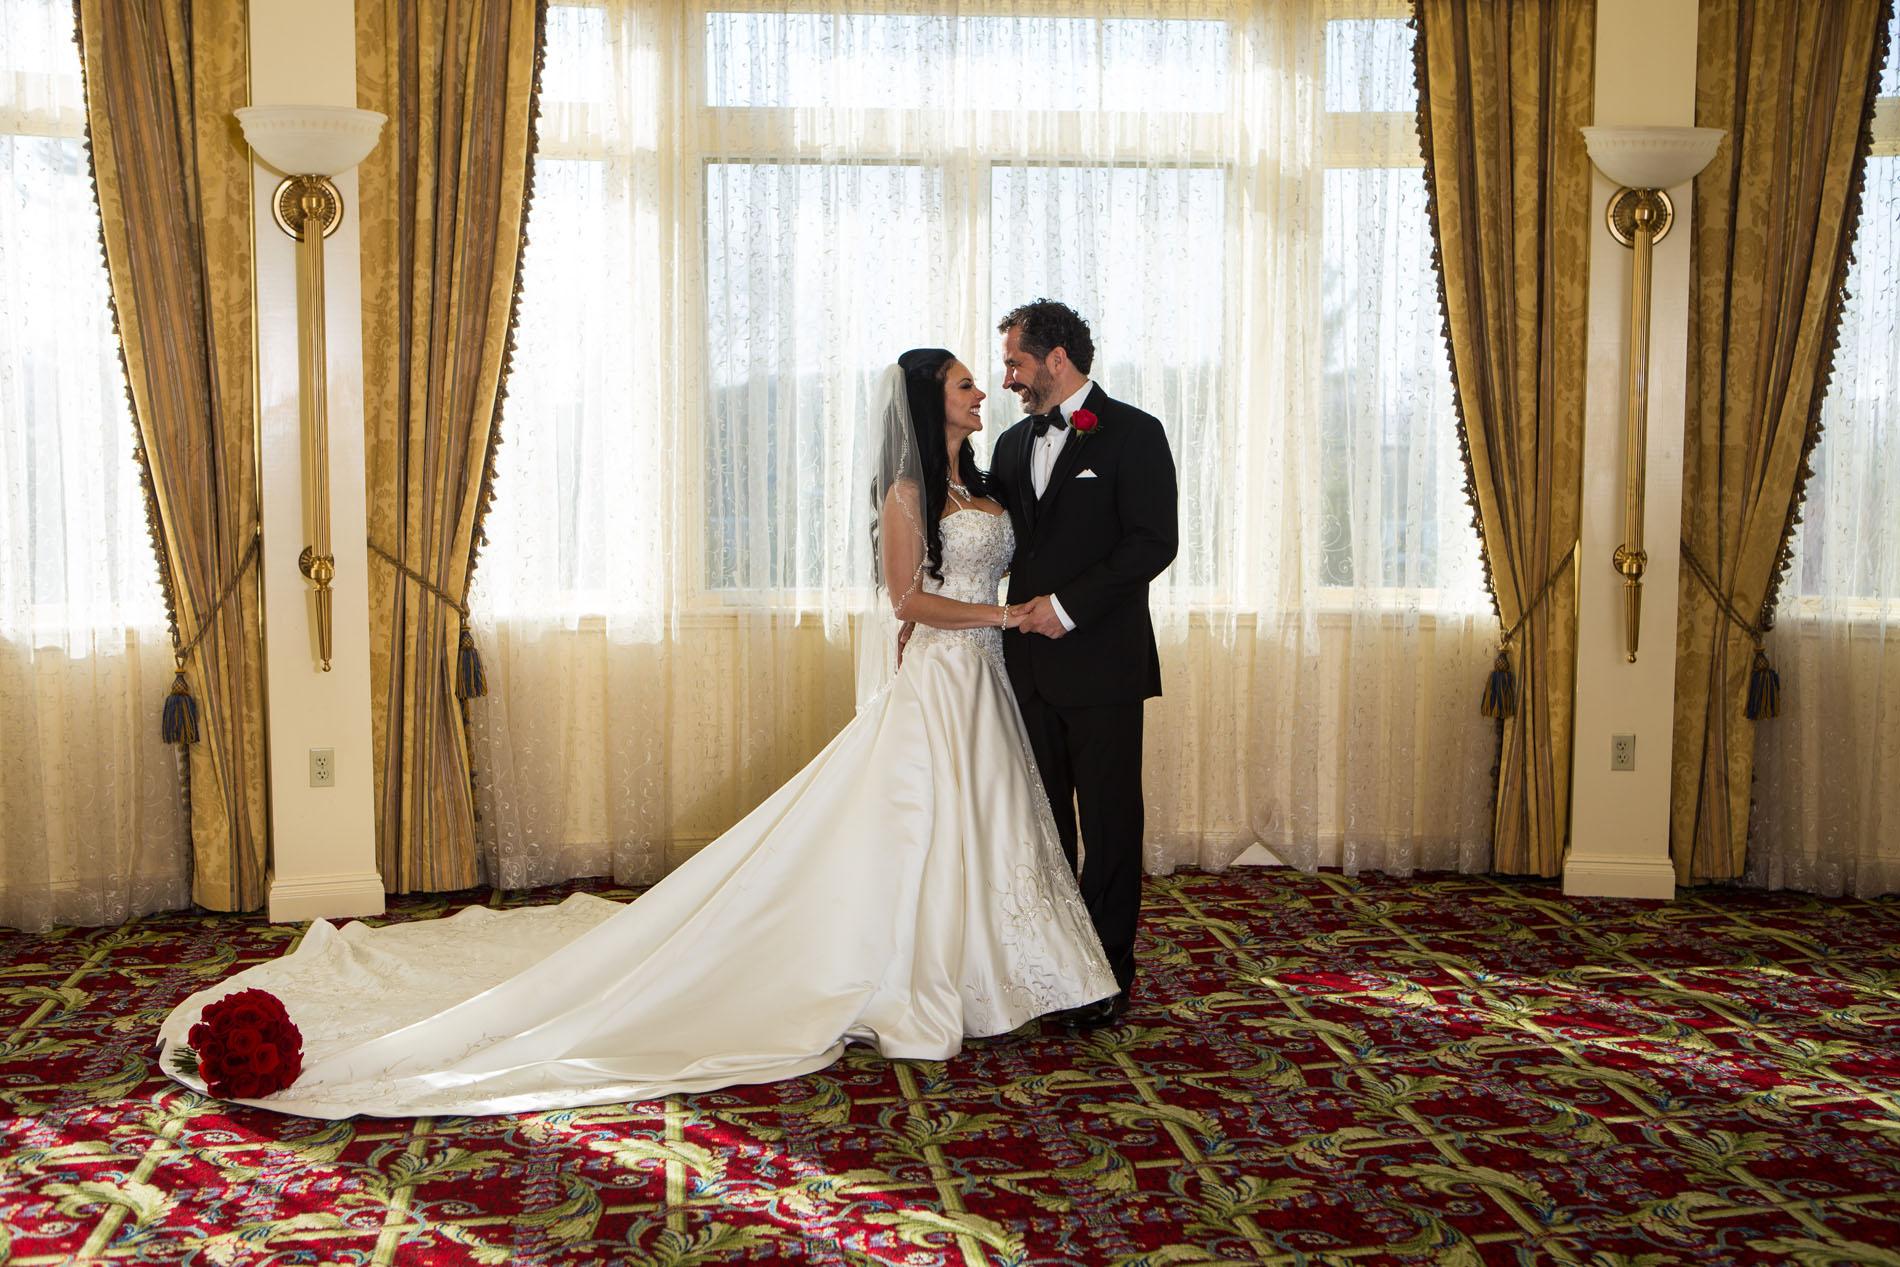 The Wentworth Wedding of Noel and Jaron